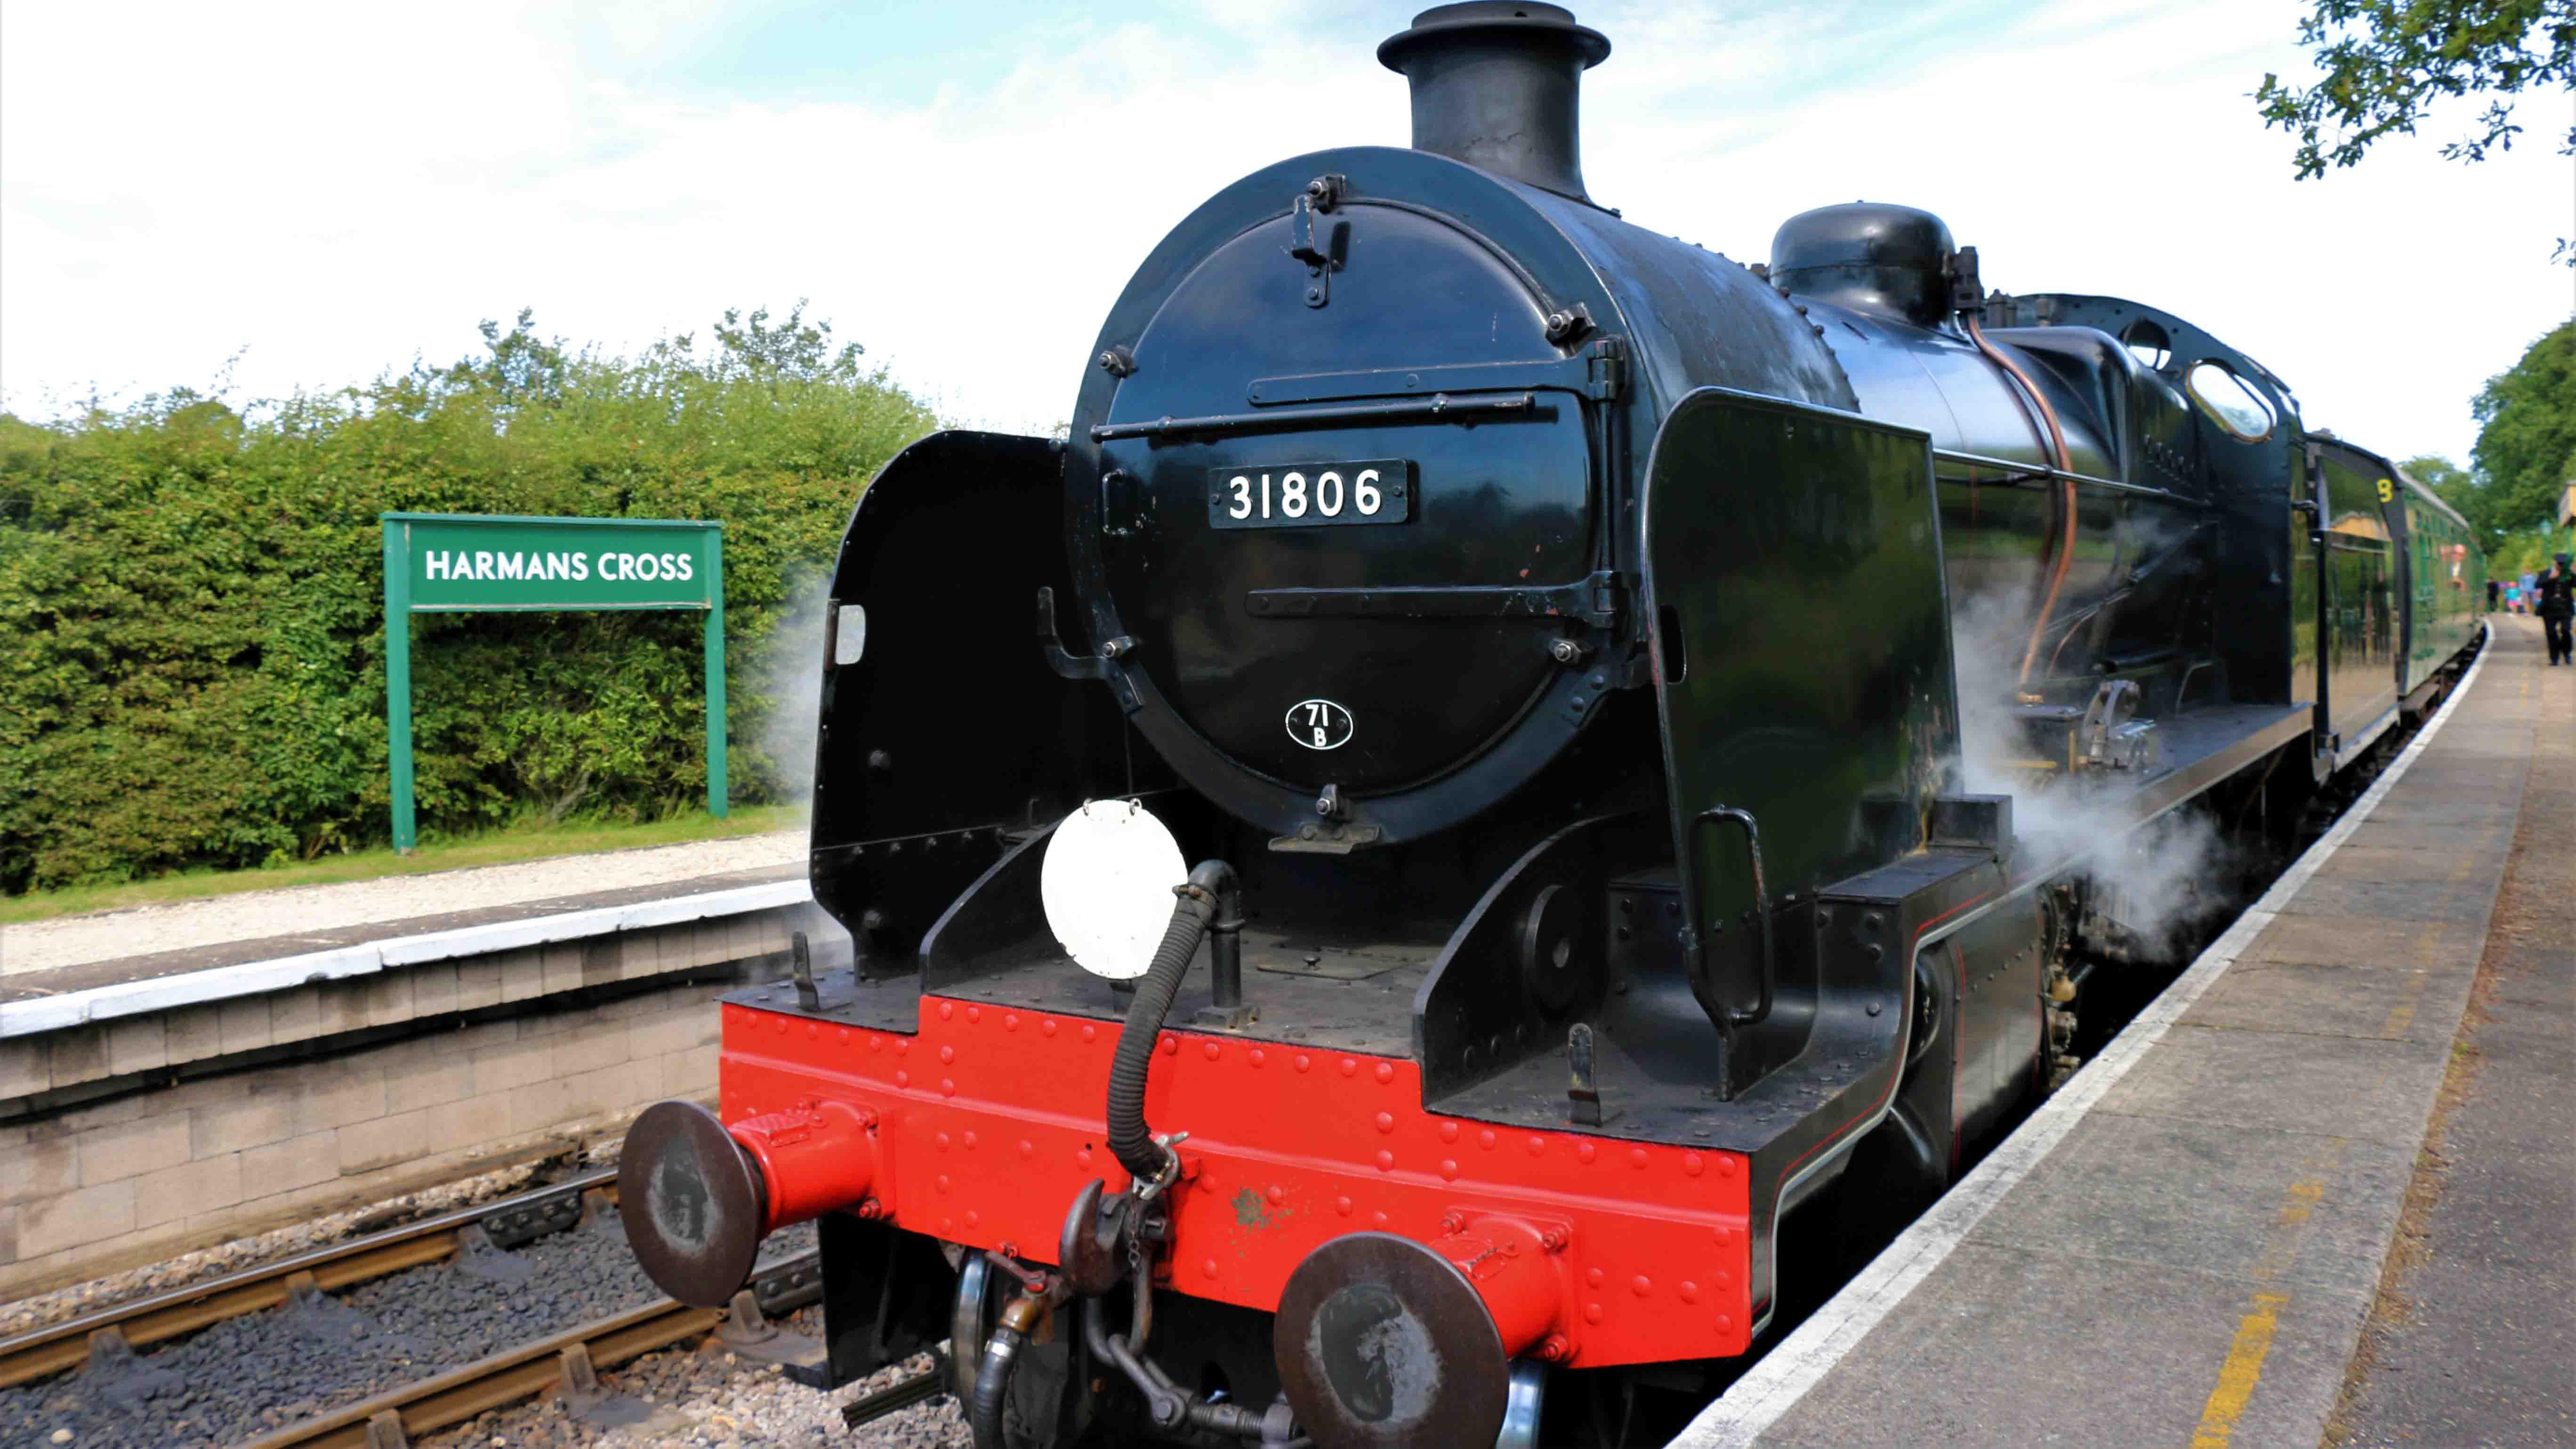 Swanage-Railway-Jamie-RTT